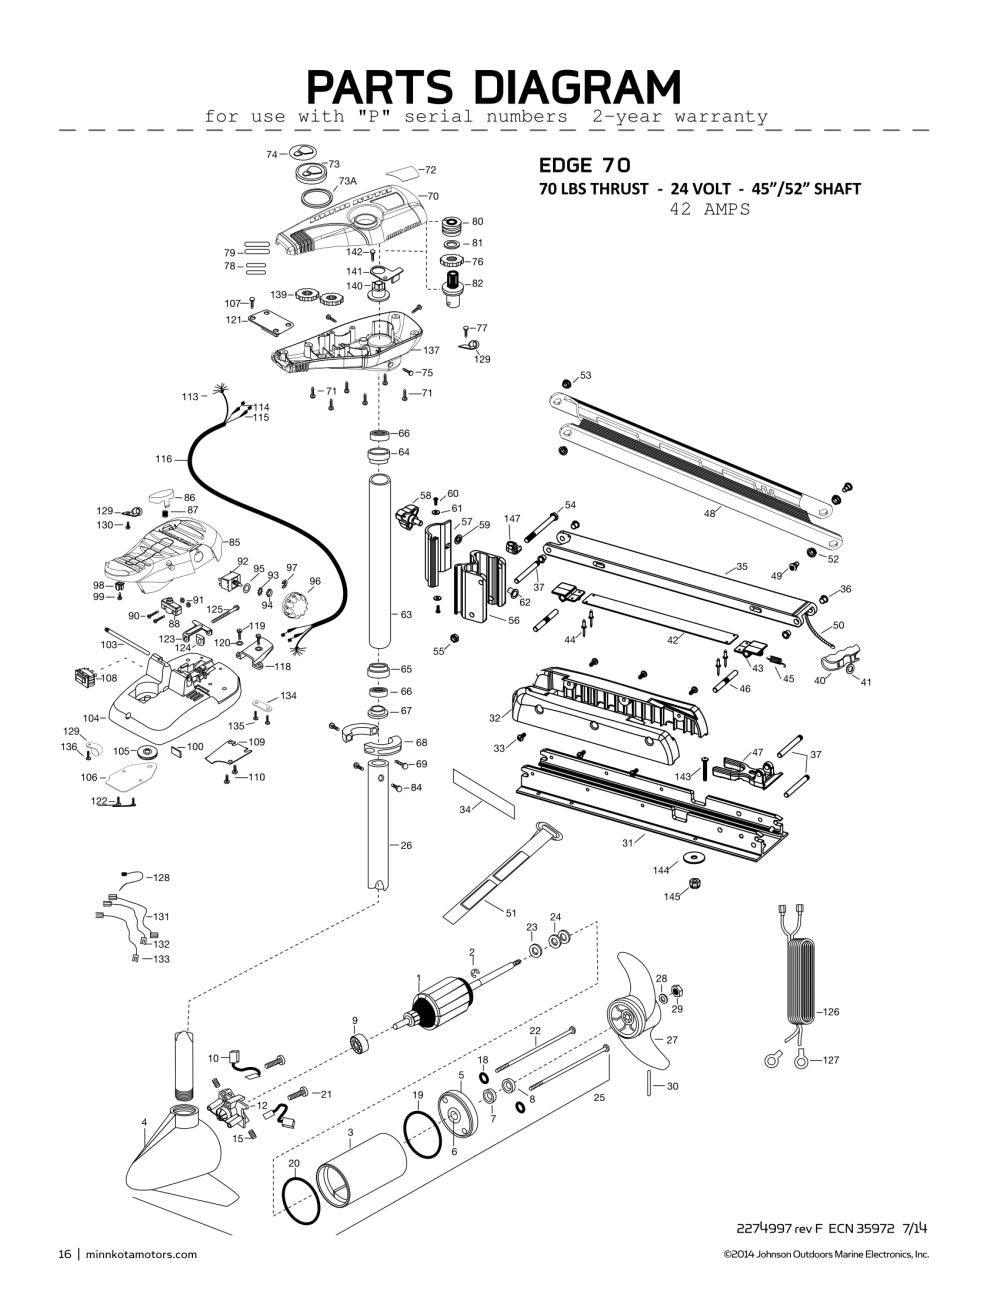 medium resolution of minn kota edge 70 wiring diagram wiring diagram toolbox minn kota edge 70 wiring diagram